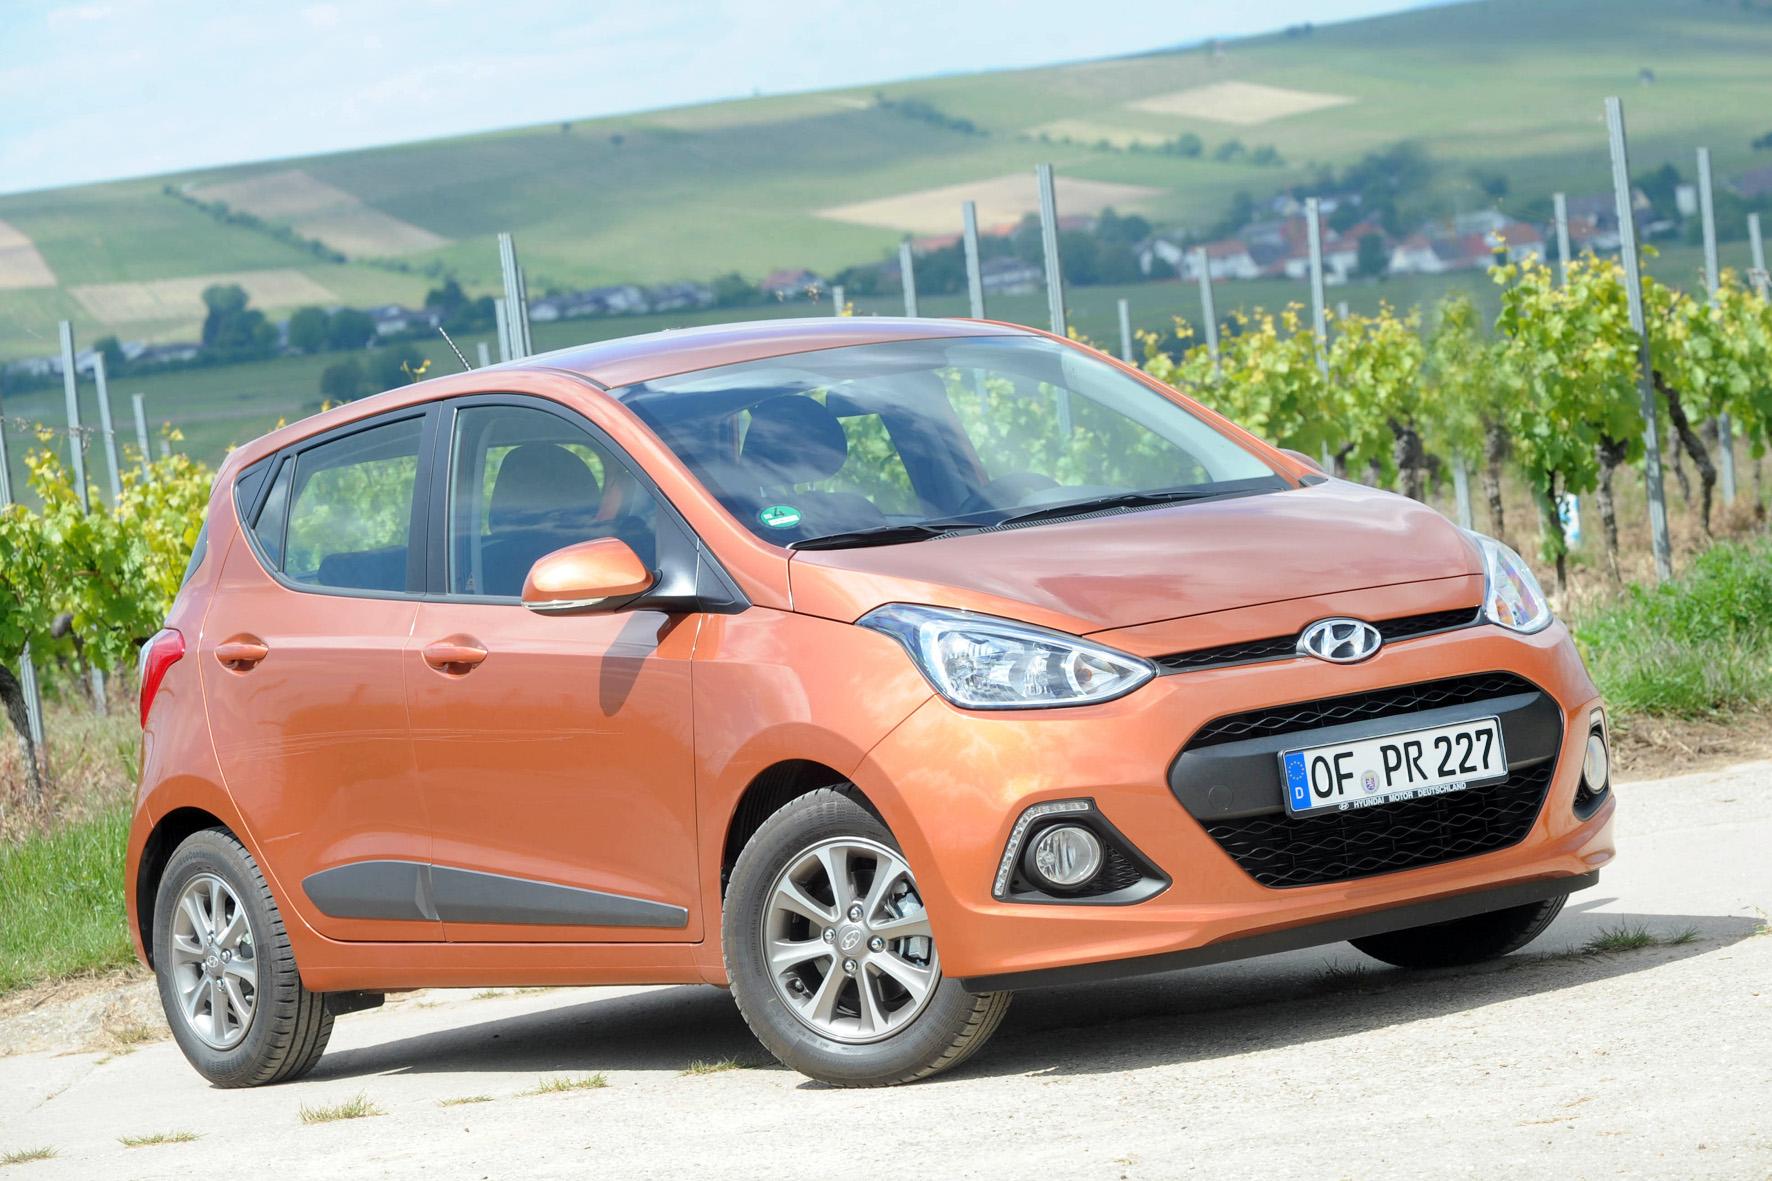 Standaufnahme vom neuen (2014) Hyundai i10 in orange